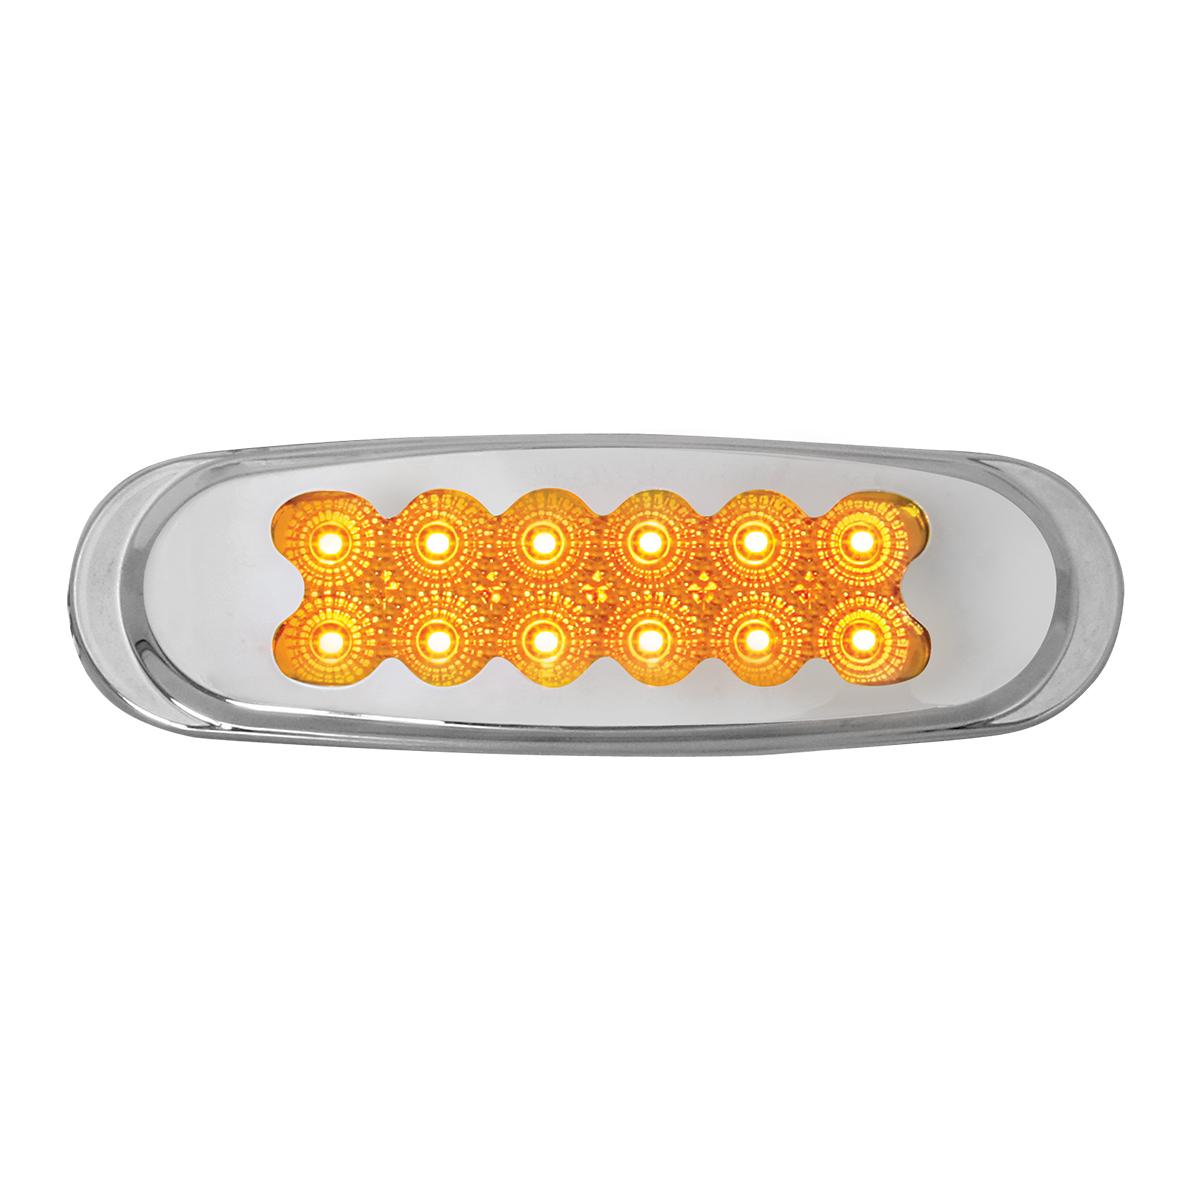 76705 Ultra Thin Dual Function Spyder LED Light w/ Chrome Plastic Matrix Bezel